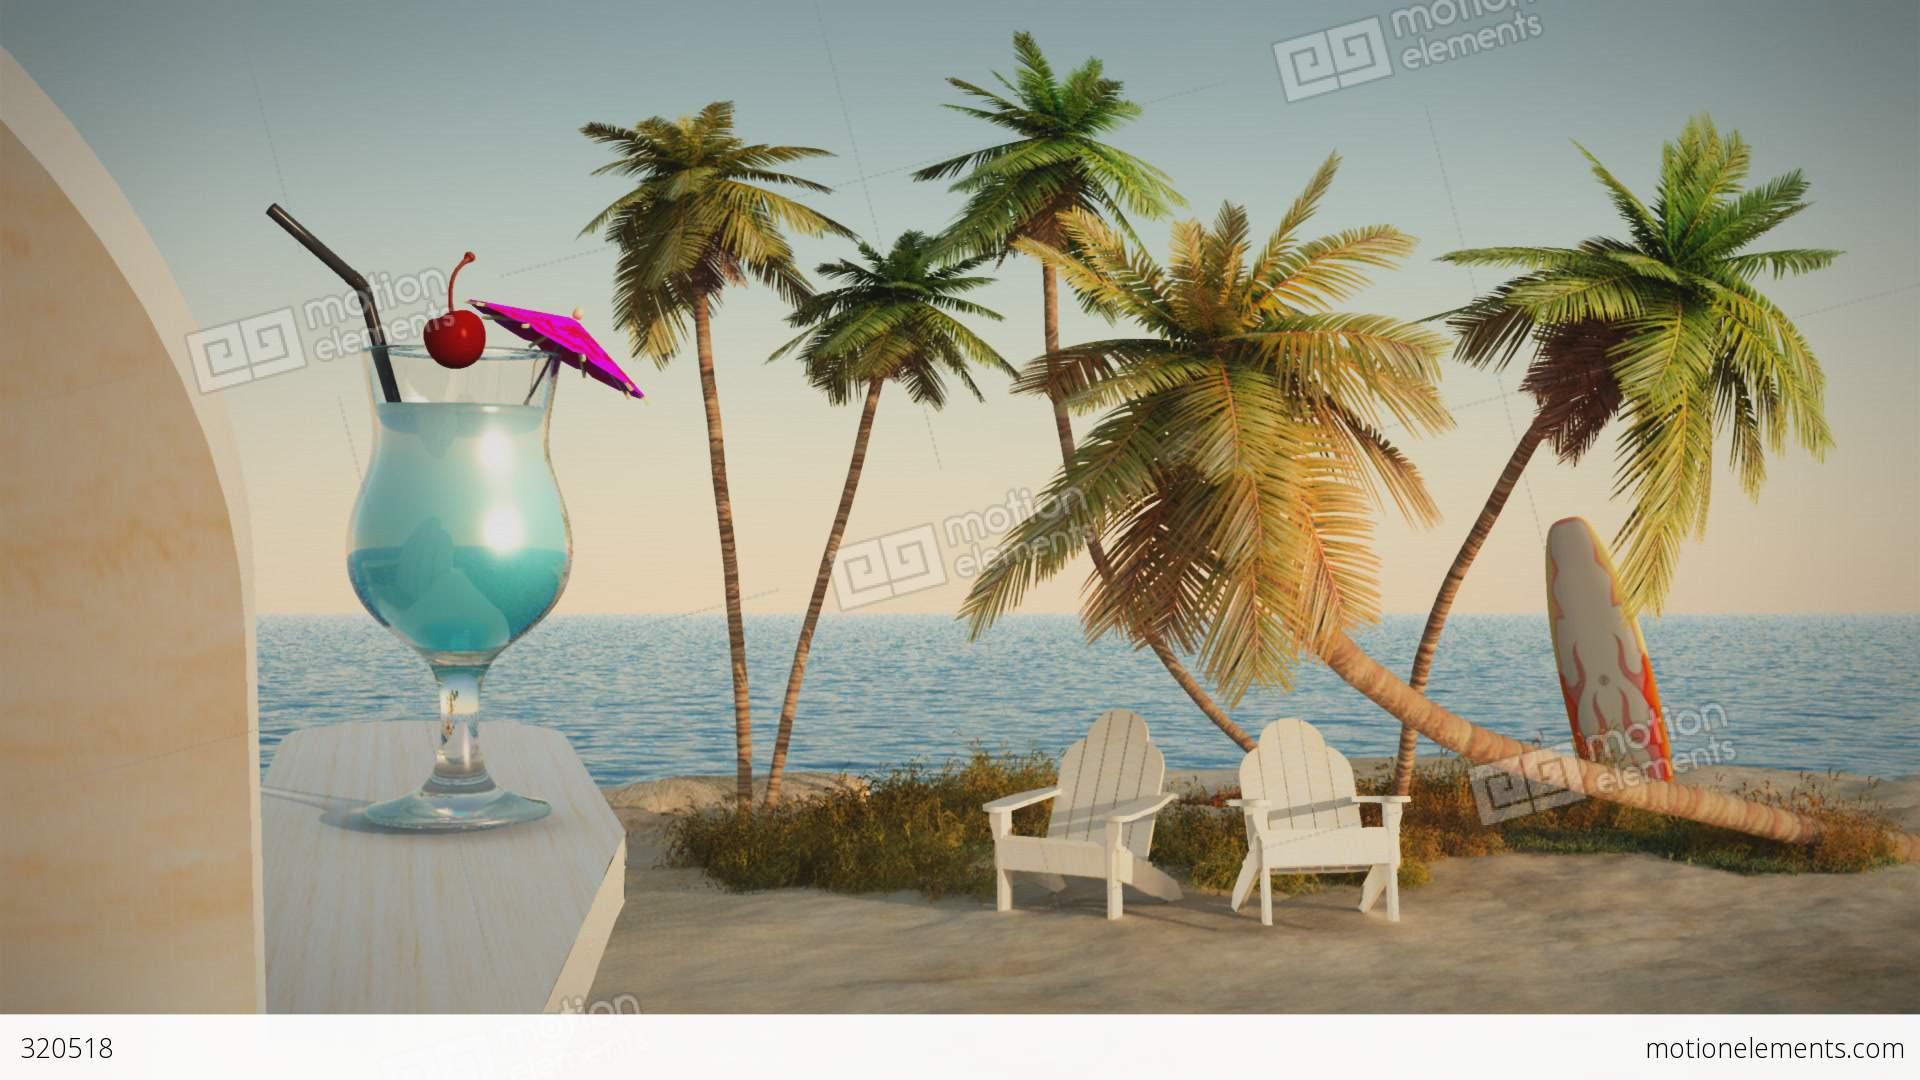 Romantic Pictures Of Tropical Beaches: (1191) Romantic Tropical Beach Ocean Getaway Escape